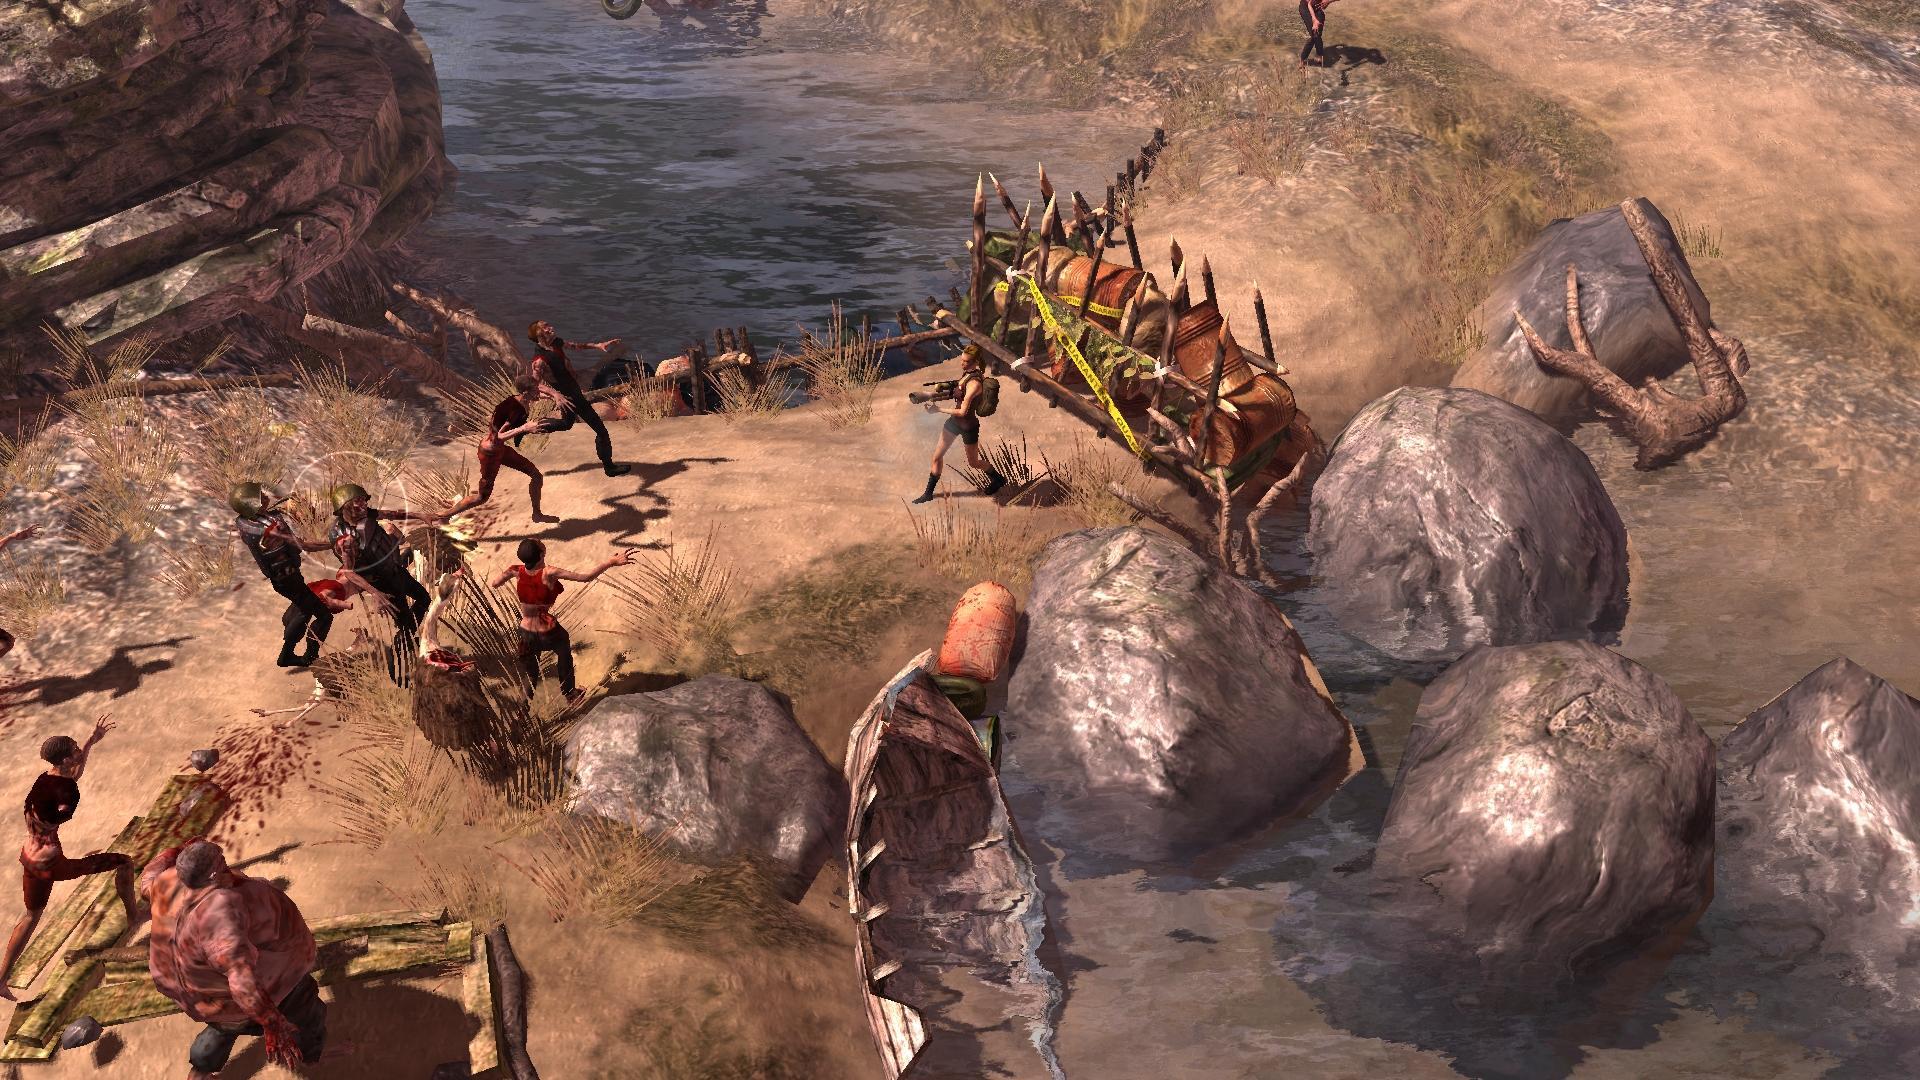 nat-games-how-to-survive-scrrenshot-1